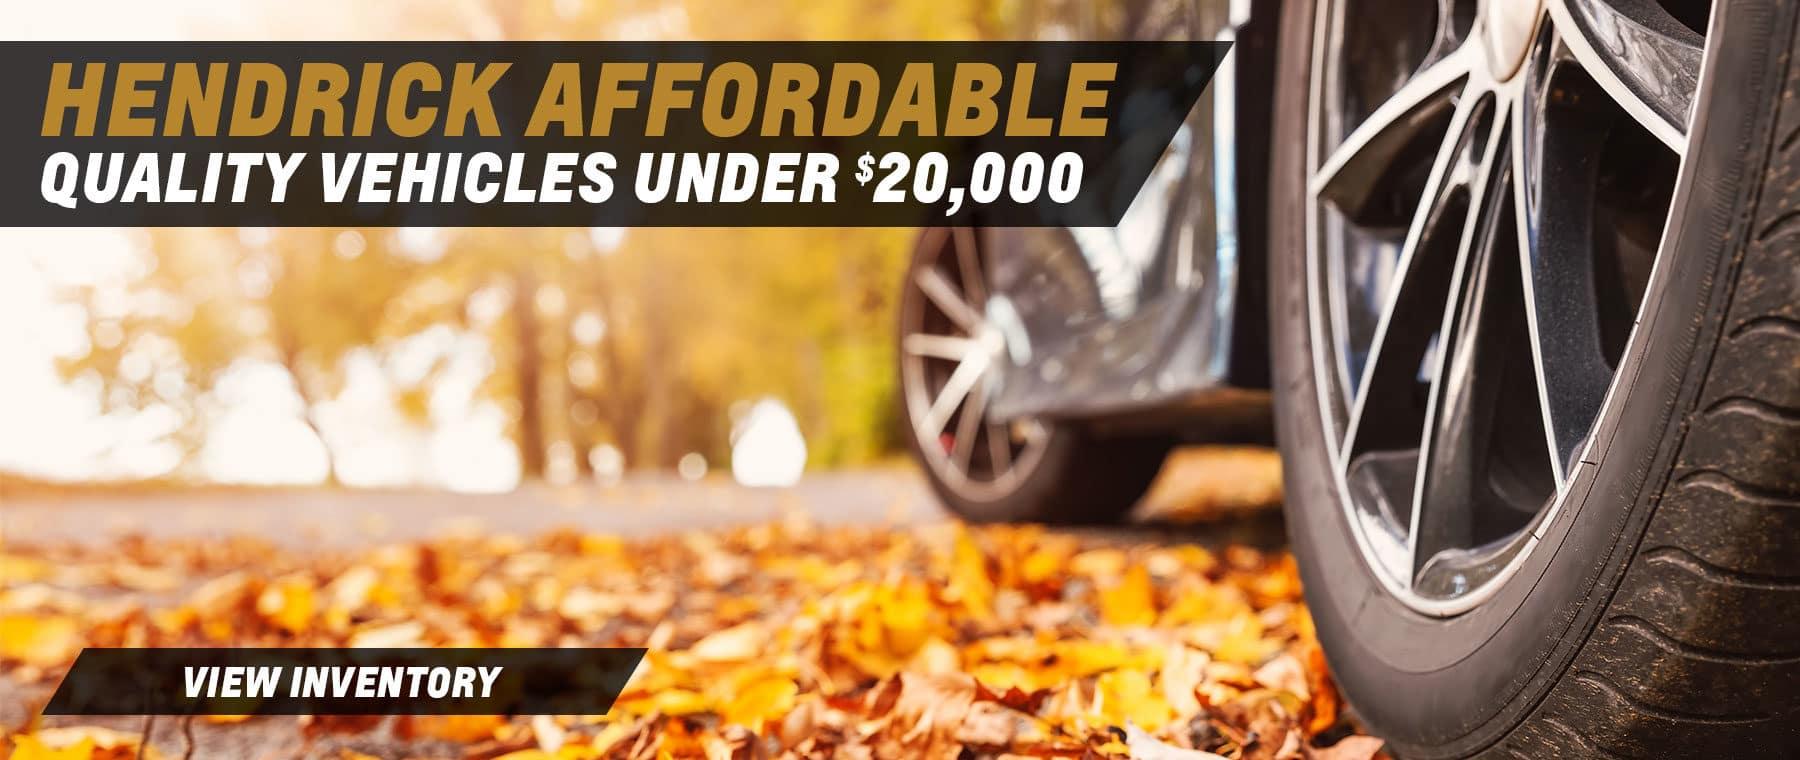 RHchevyDuluth_Sep21_JM_Pre-owned_affordable_1800x760